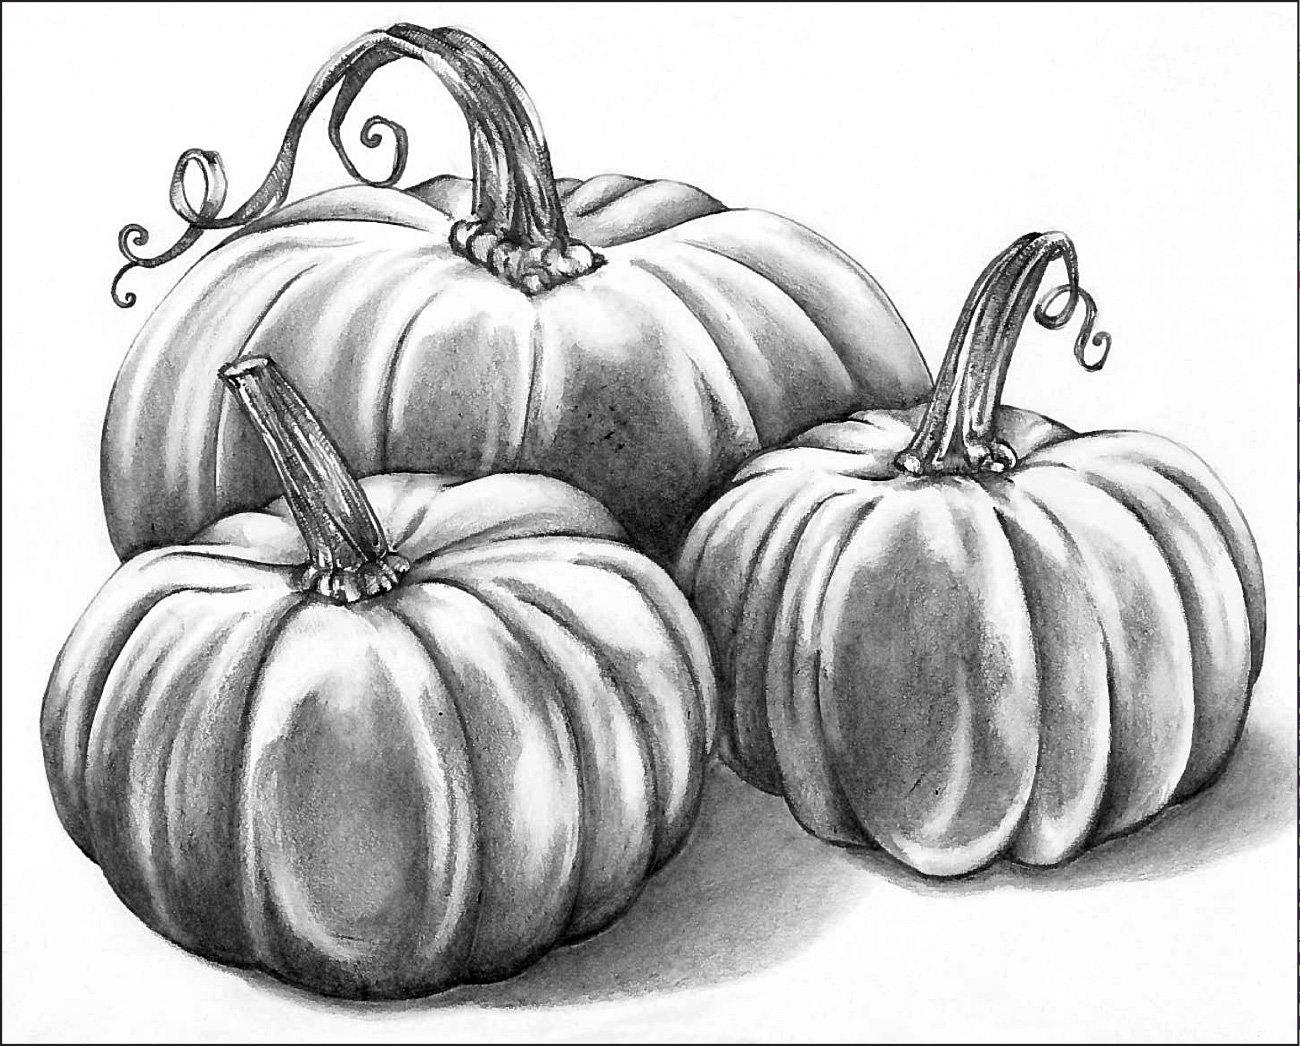 1300x1046 Graphite Pencil Pumpkin Patch Drawing Graphite